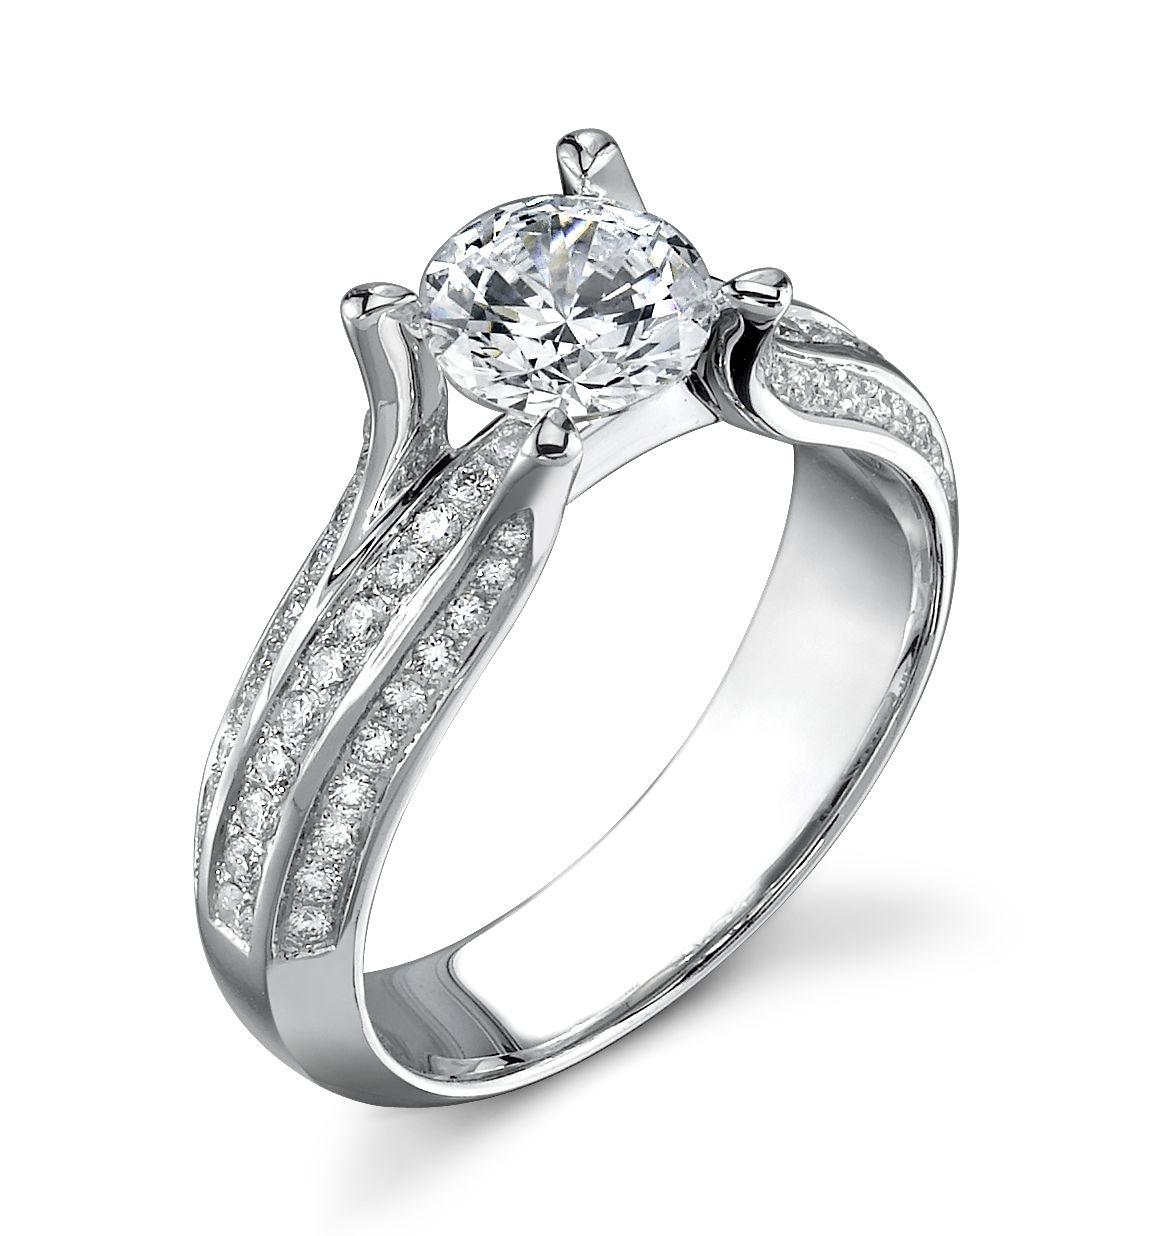 Sylvie SY013 Mark Allen Jewelers Wedding rings, Jewels